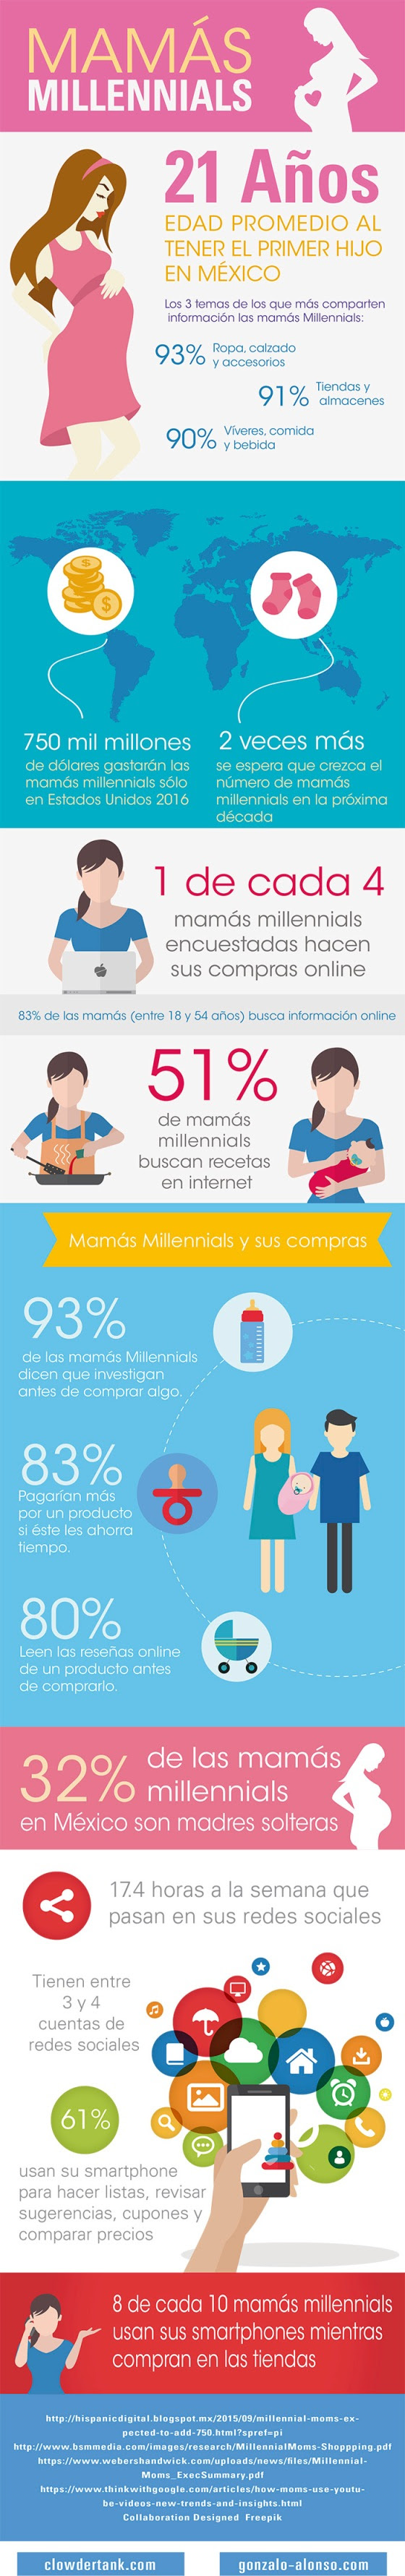 Madres millenials